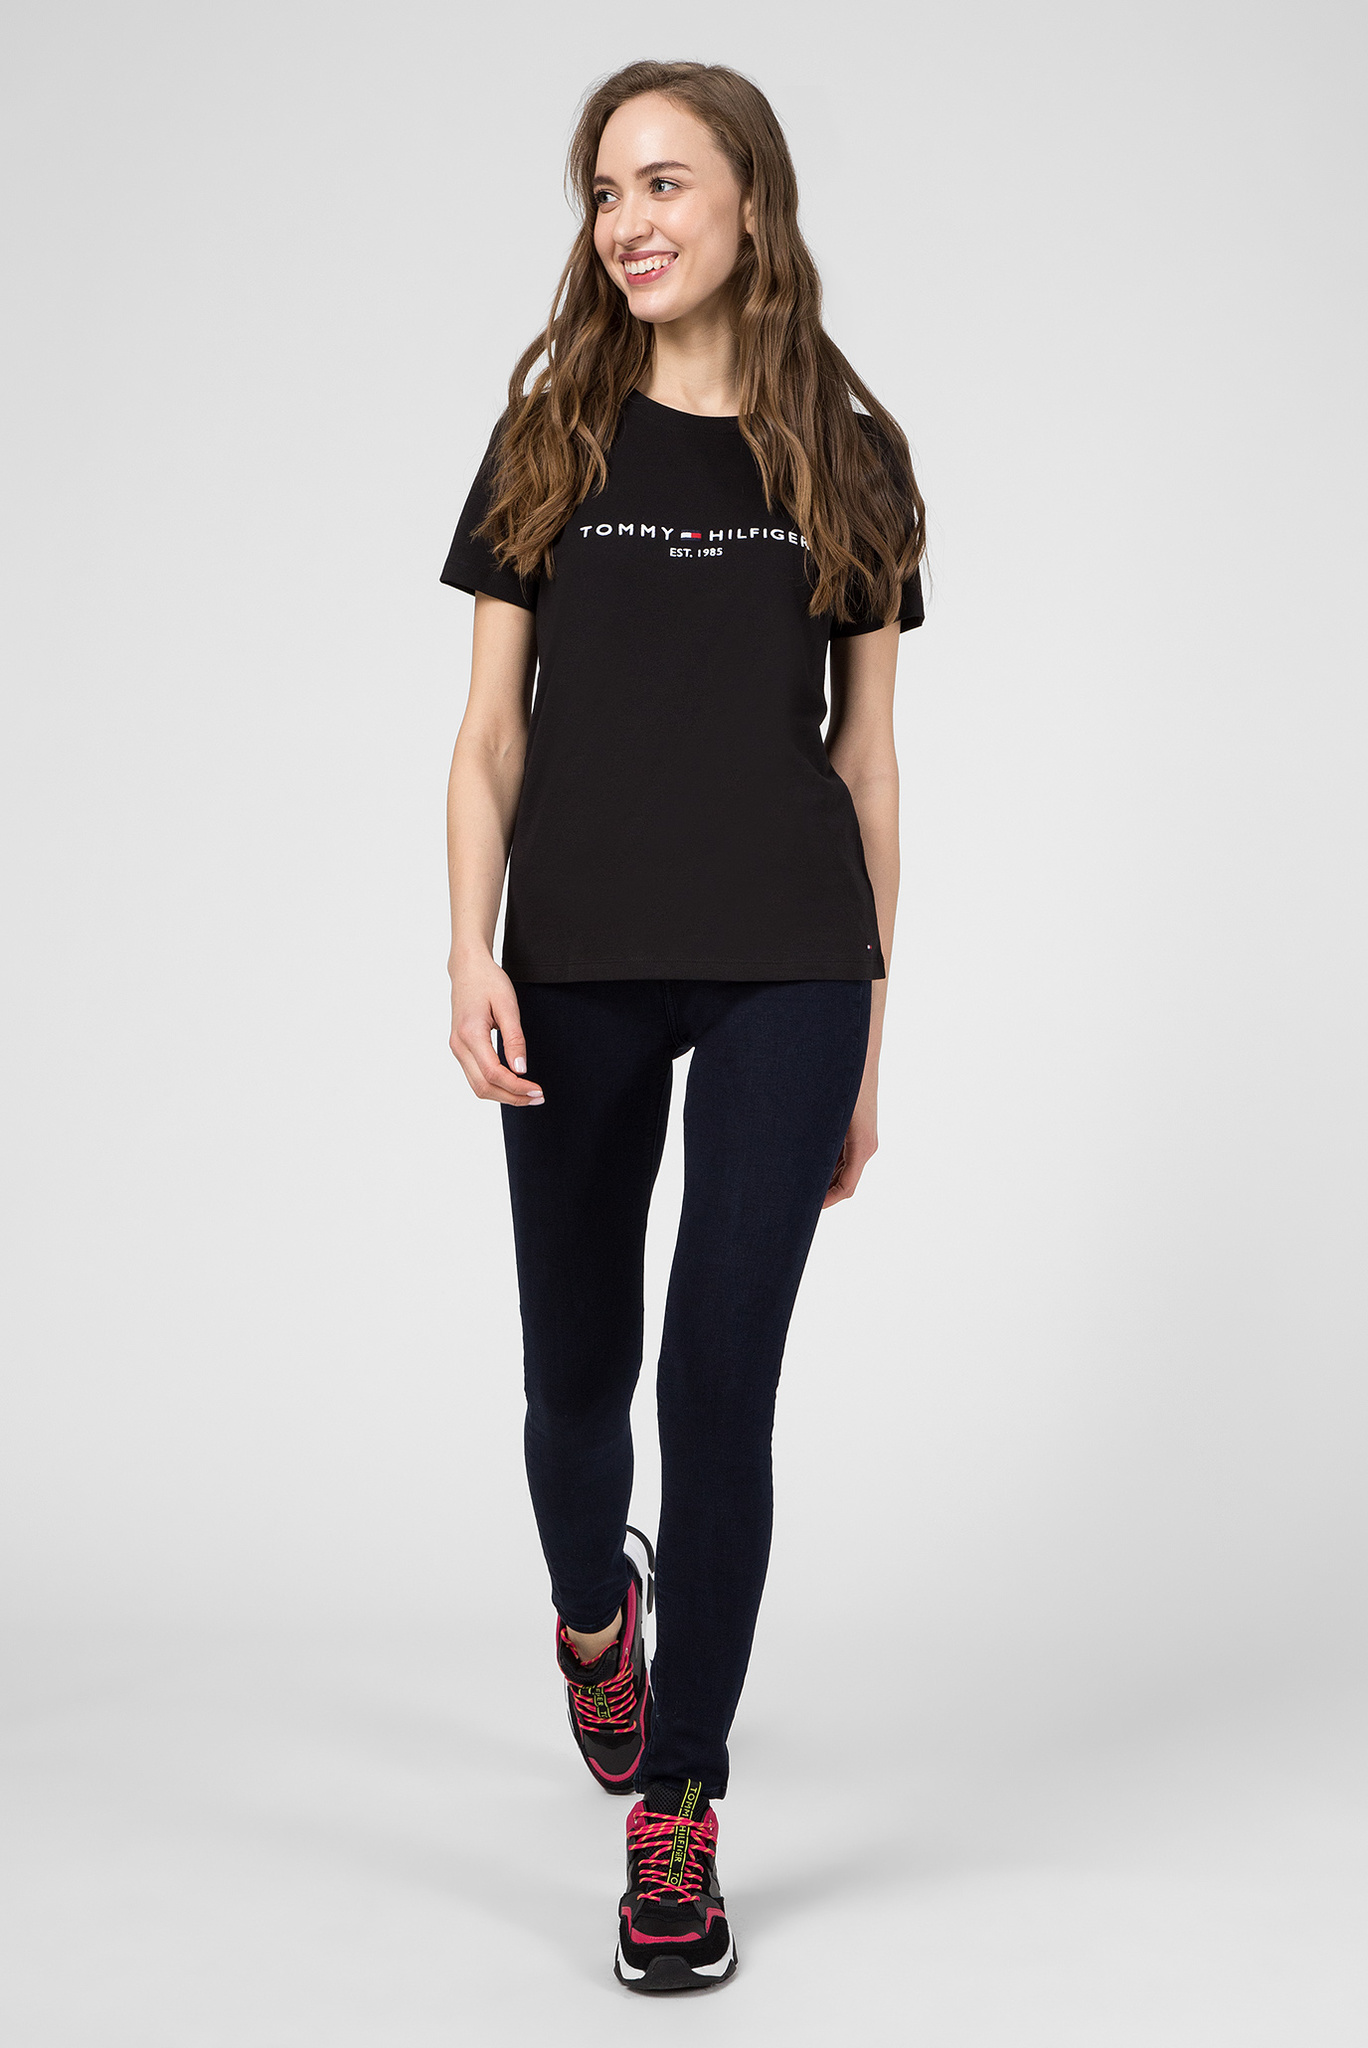 Женская черная футболка NEW TH ESS Tommy Hilfiger